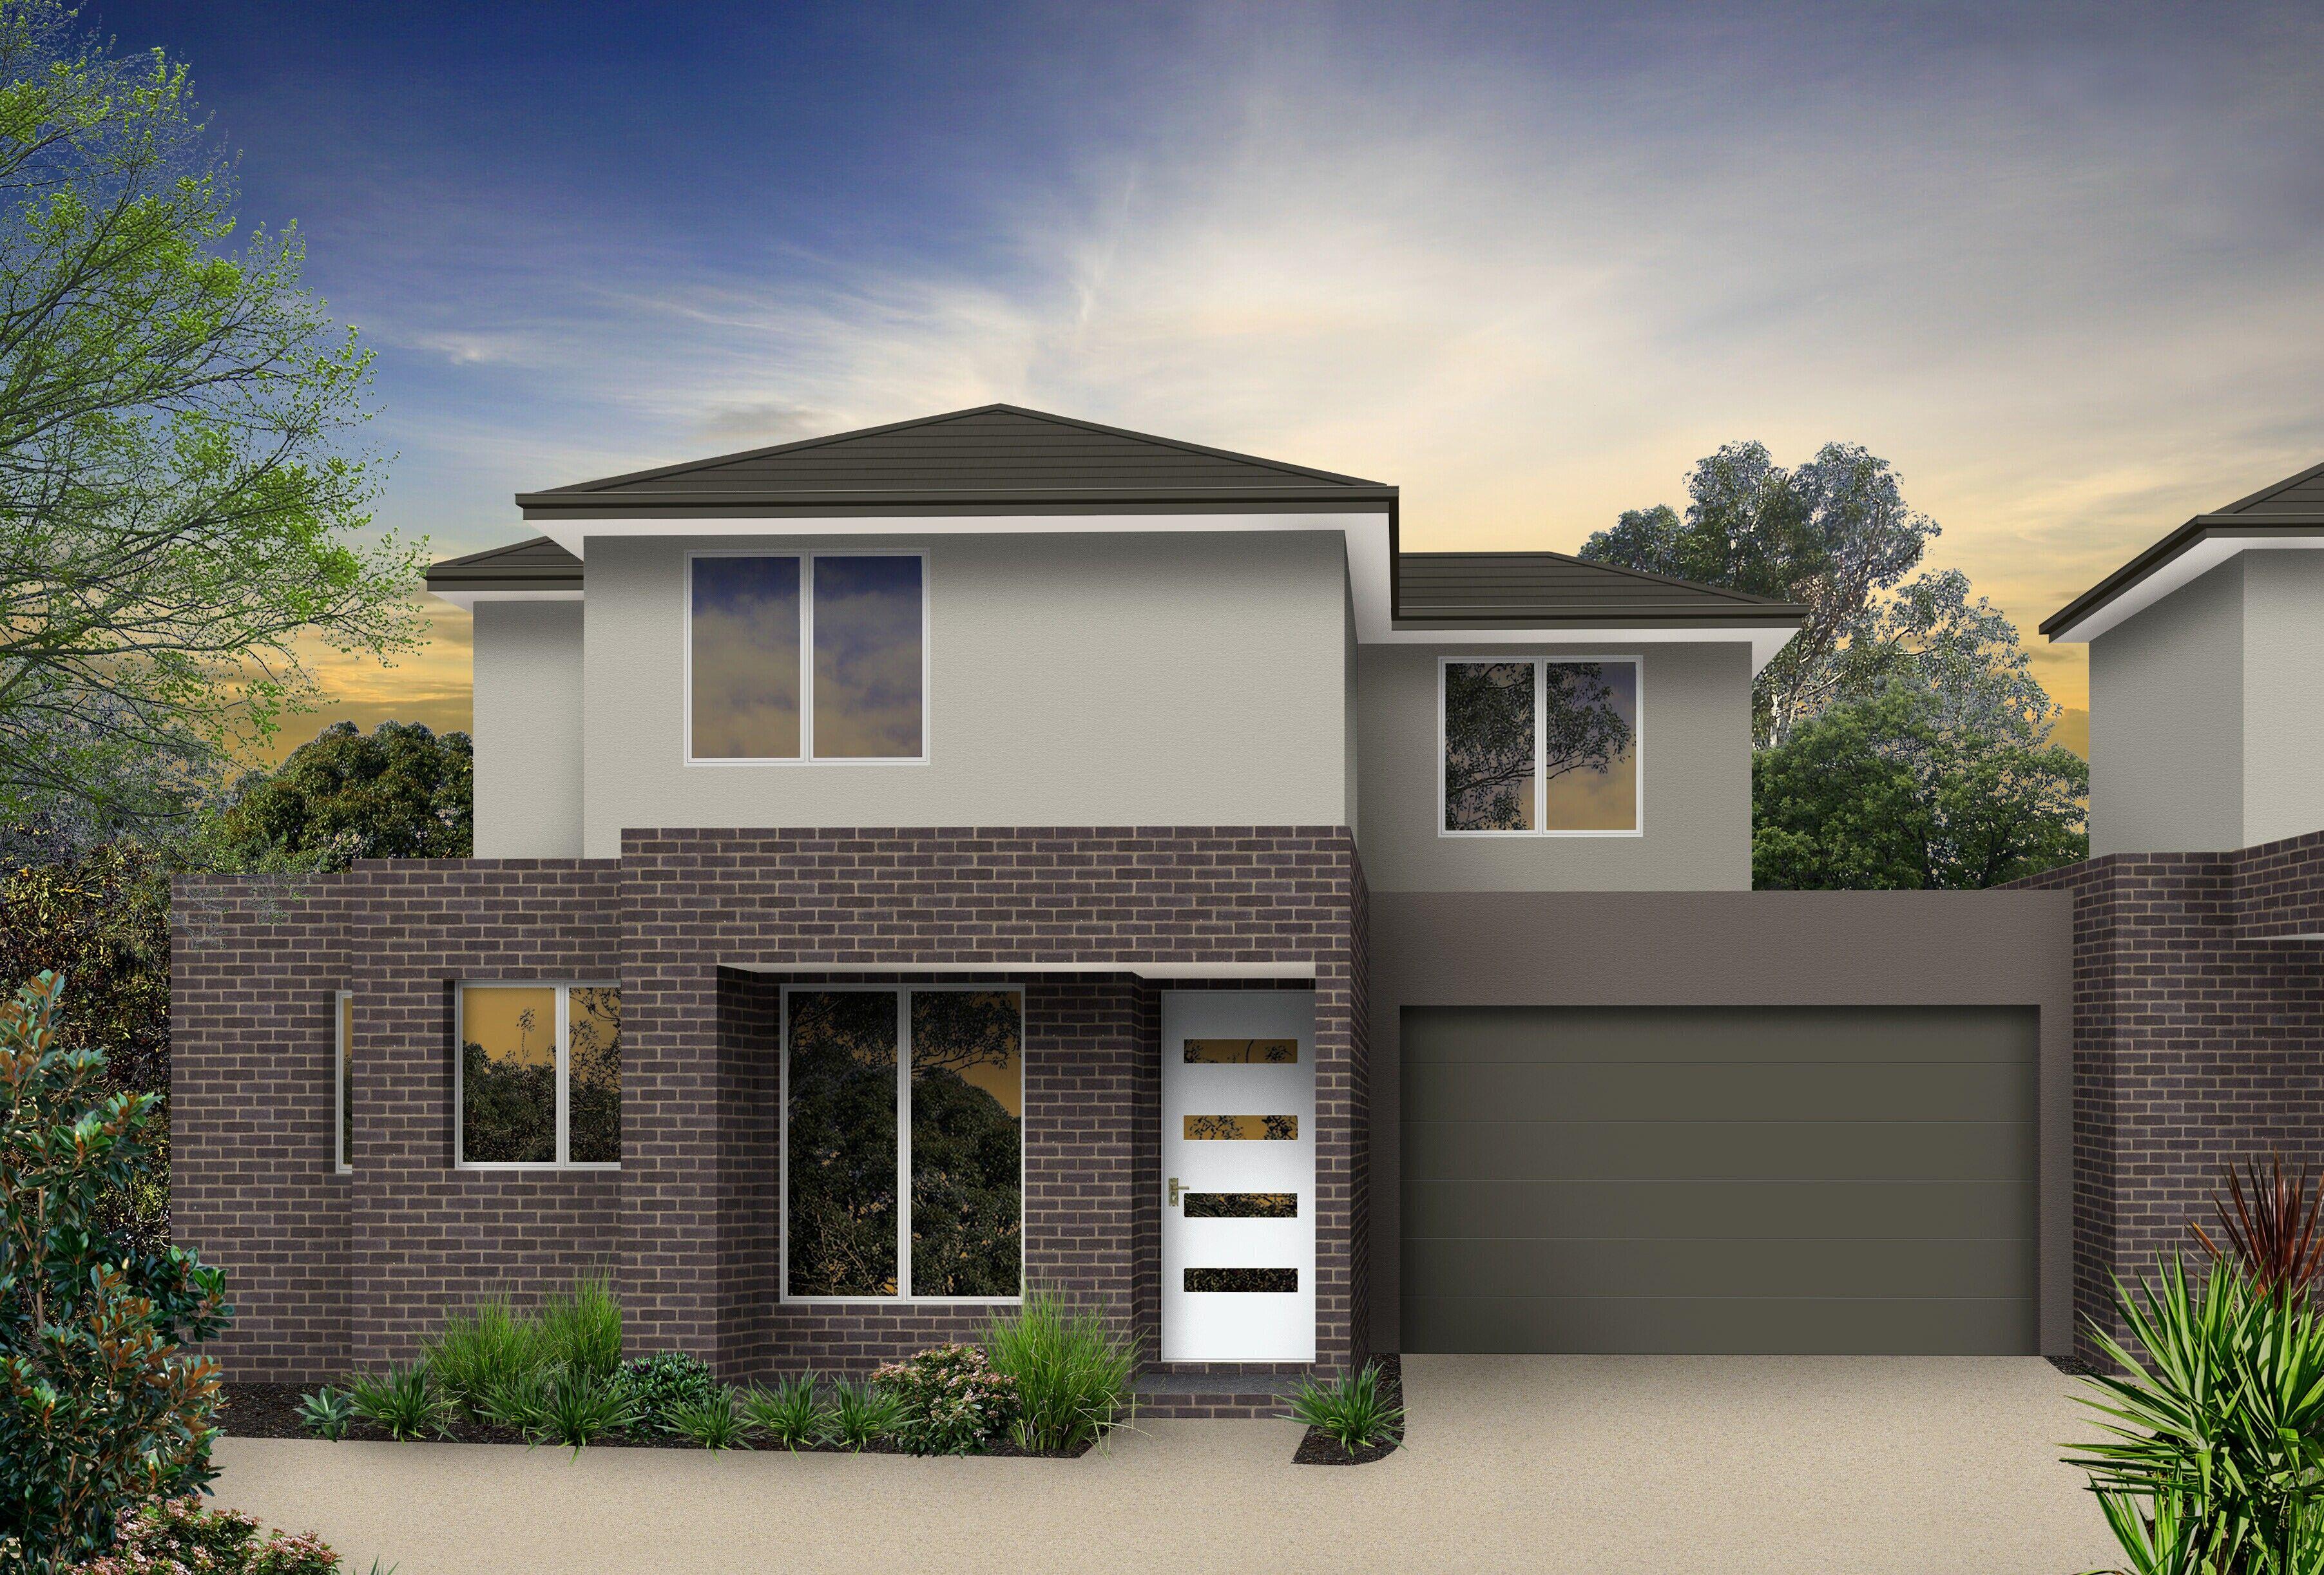 Home design bilder eine etage 墨尔本东南区blackburn优质联排别墅lira  home design  pinterest  house